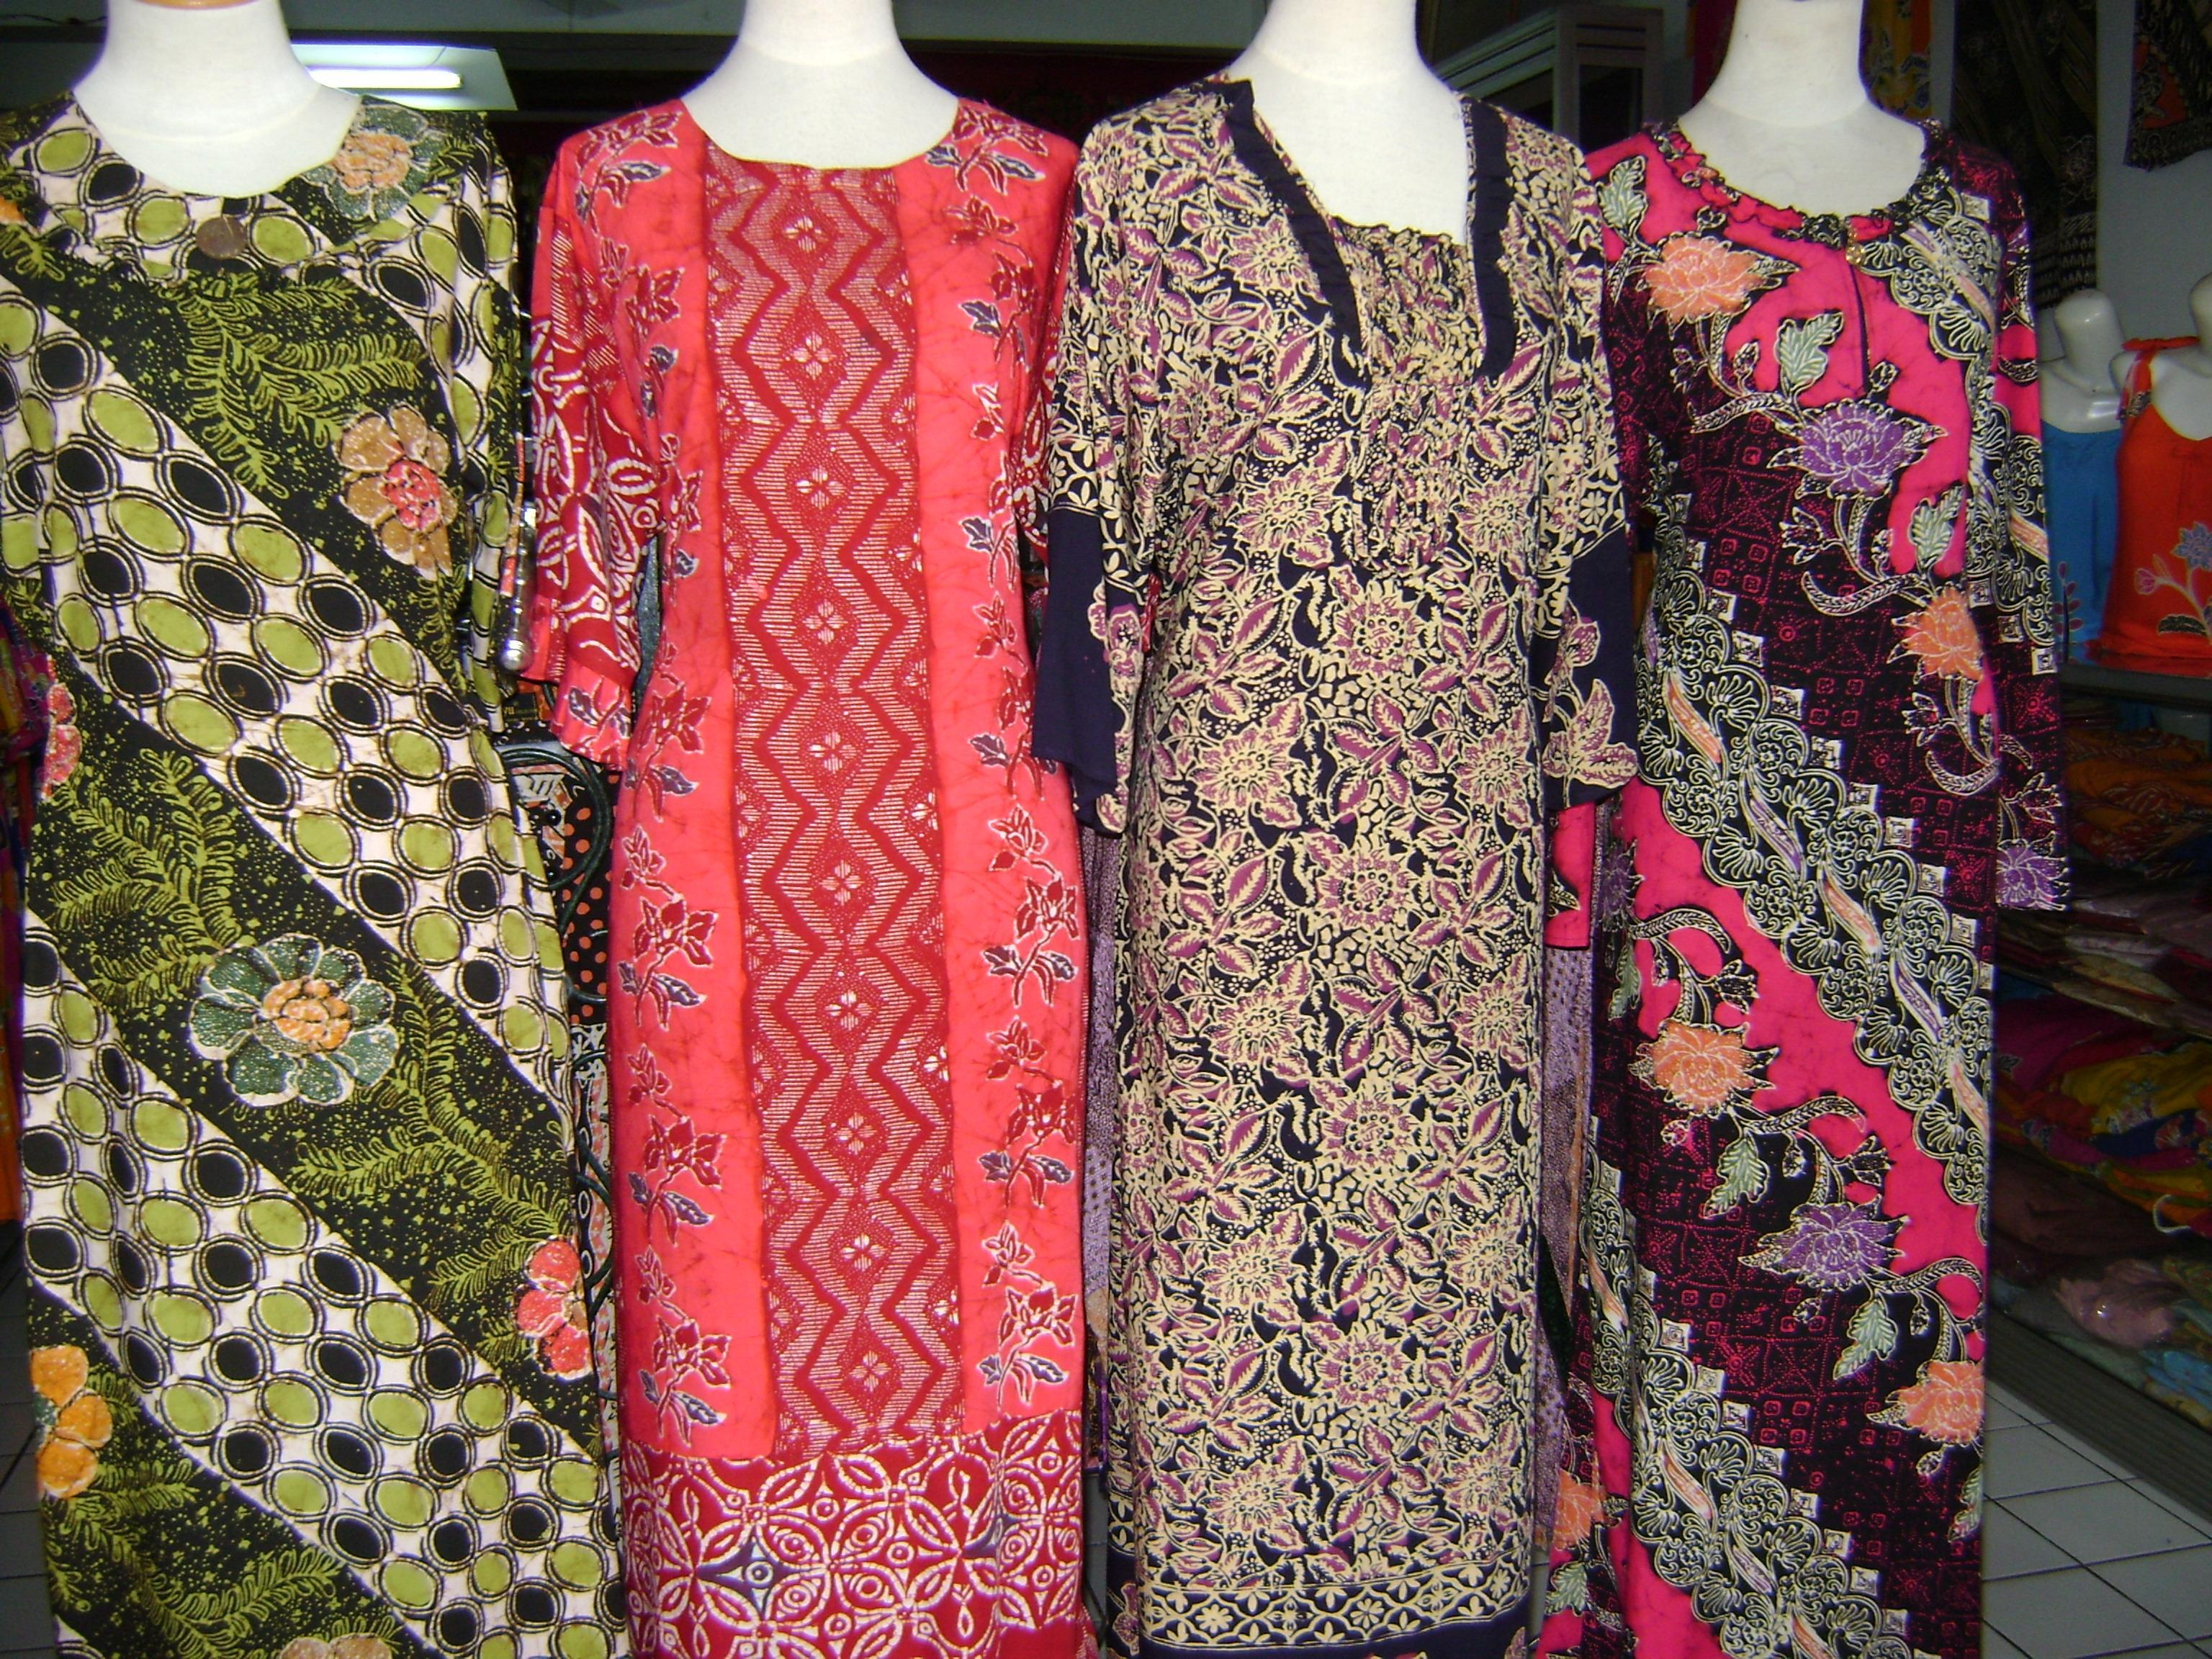 Bisnis Batik Pekalongan Batik Cirebon Batik Yogya  Moment Ku